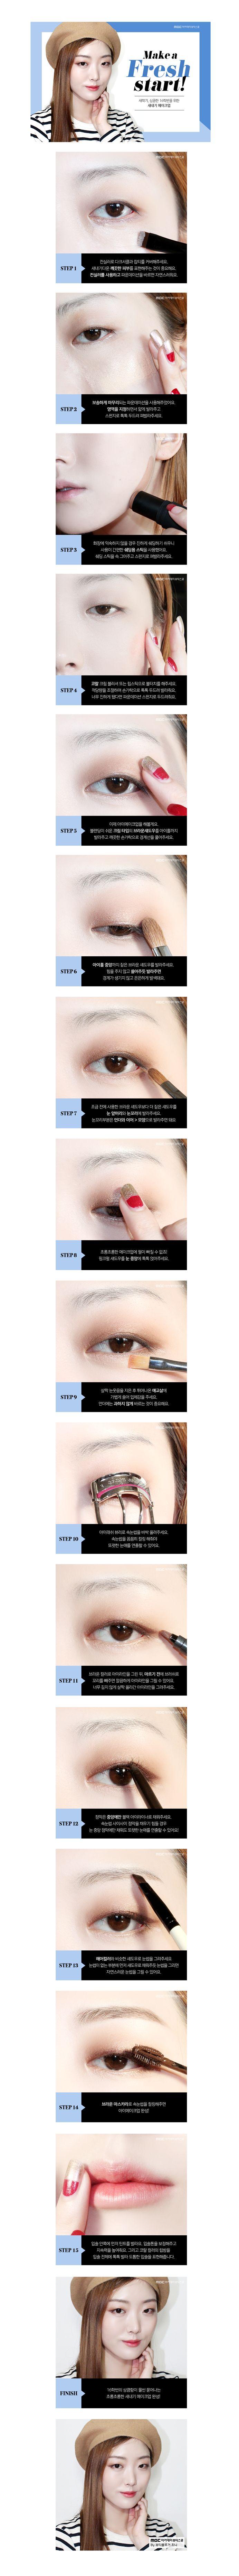 [SNS] Face book_새내기 메이크업; Beauty Contents Design